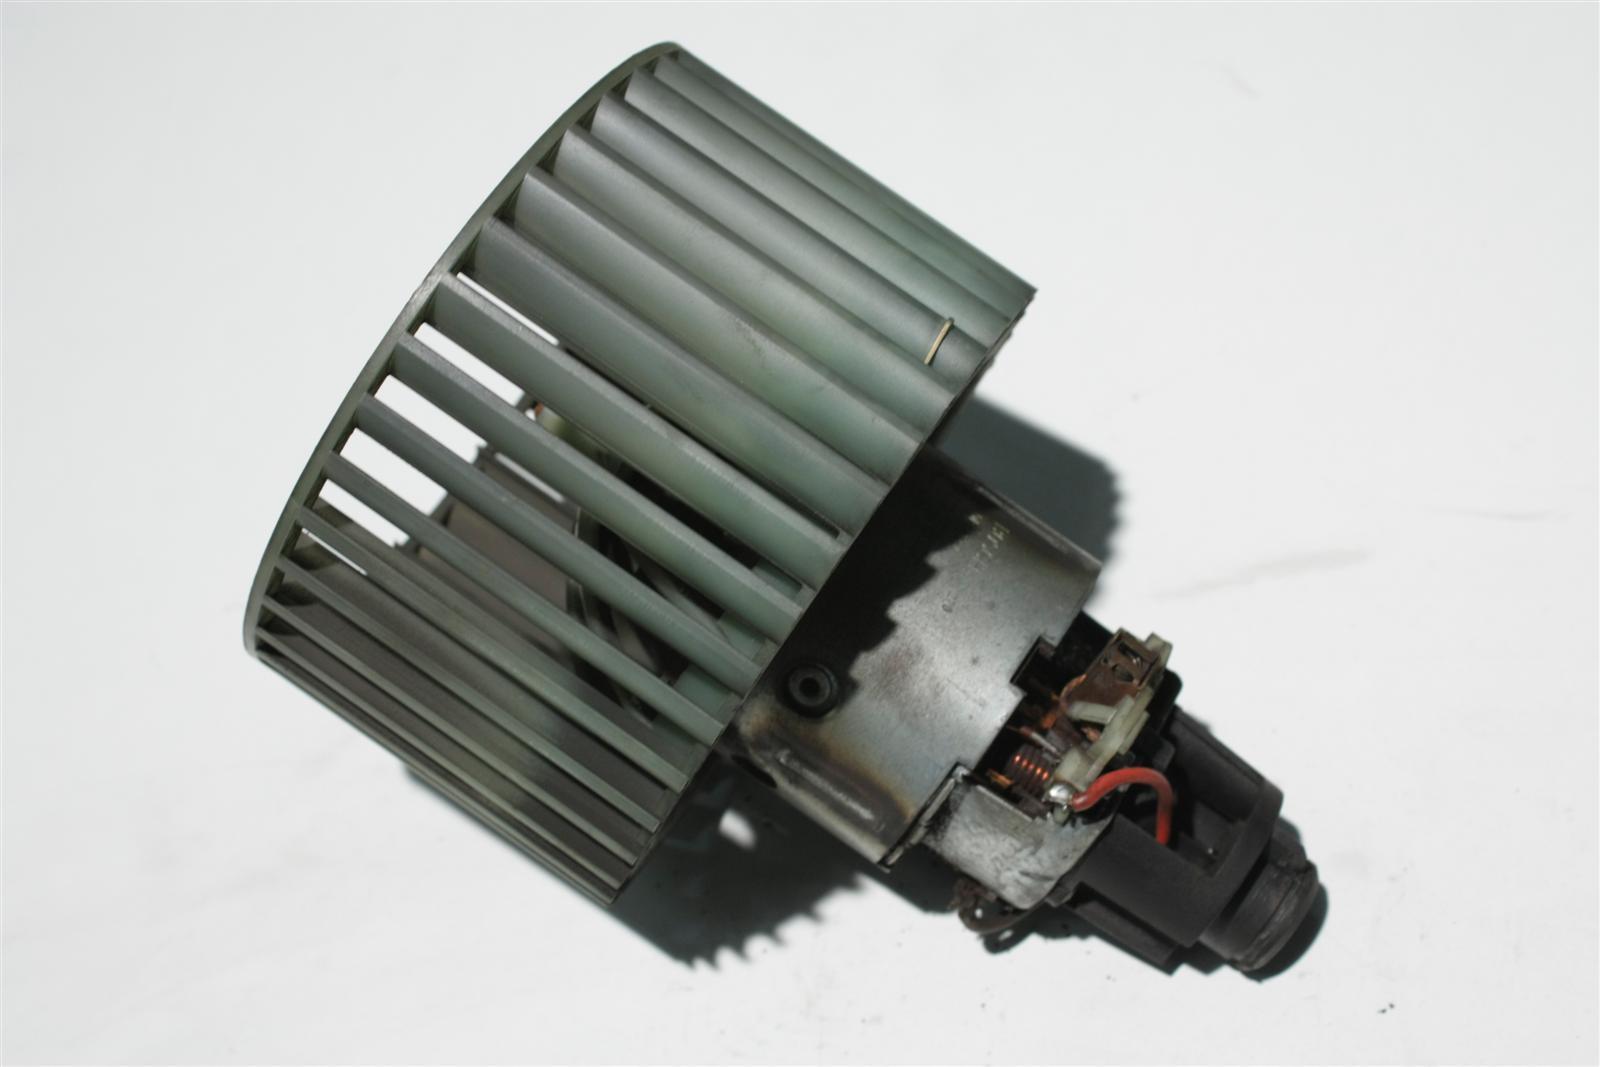 Audi 100/A6 C4/V8 D11 Gebläse Heizung/Klima 4A0959101A